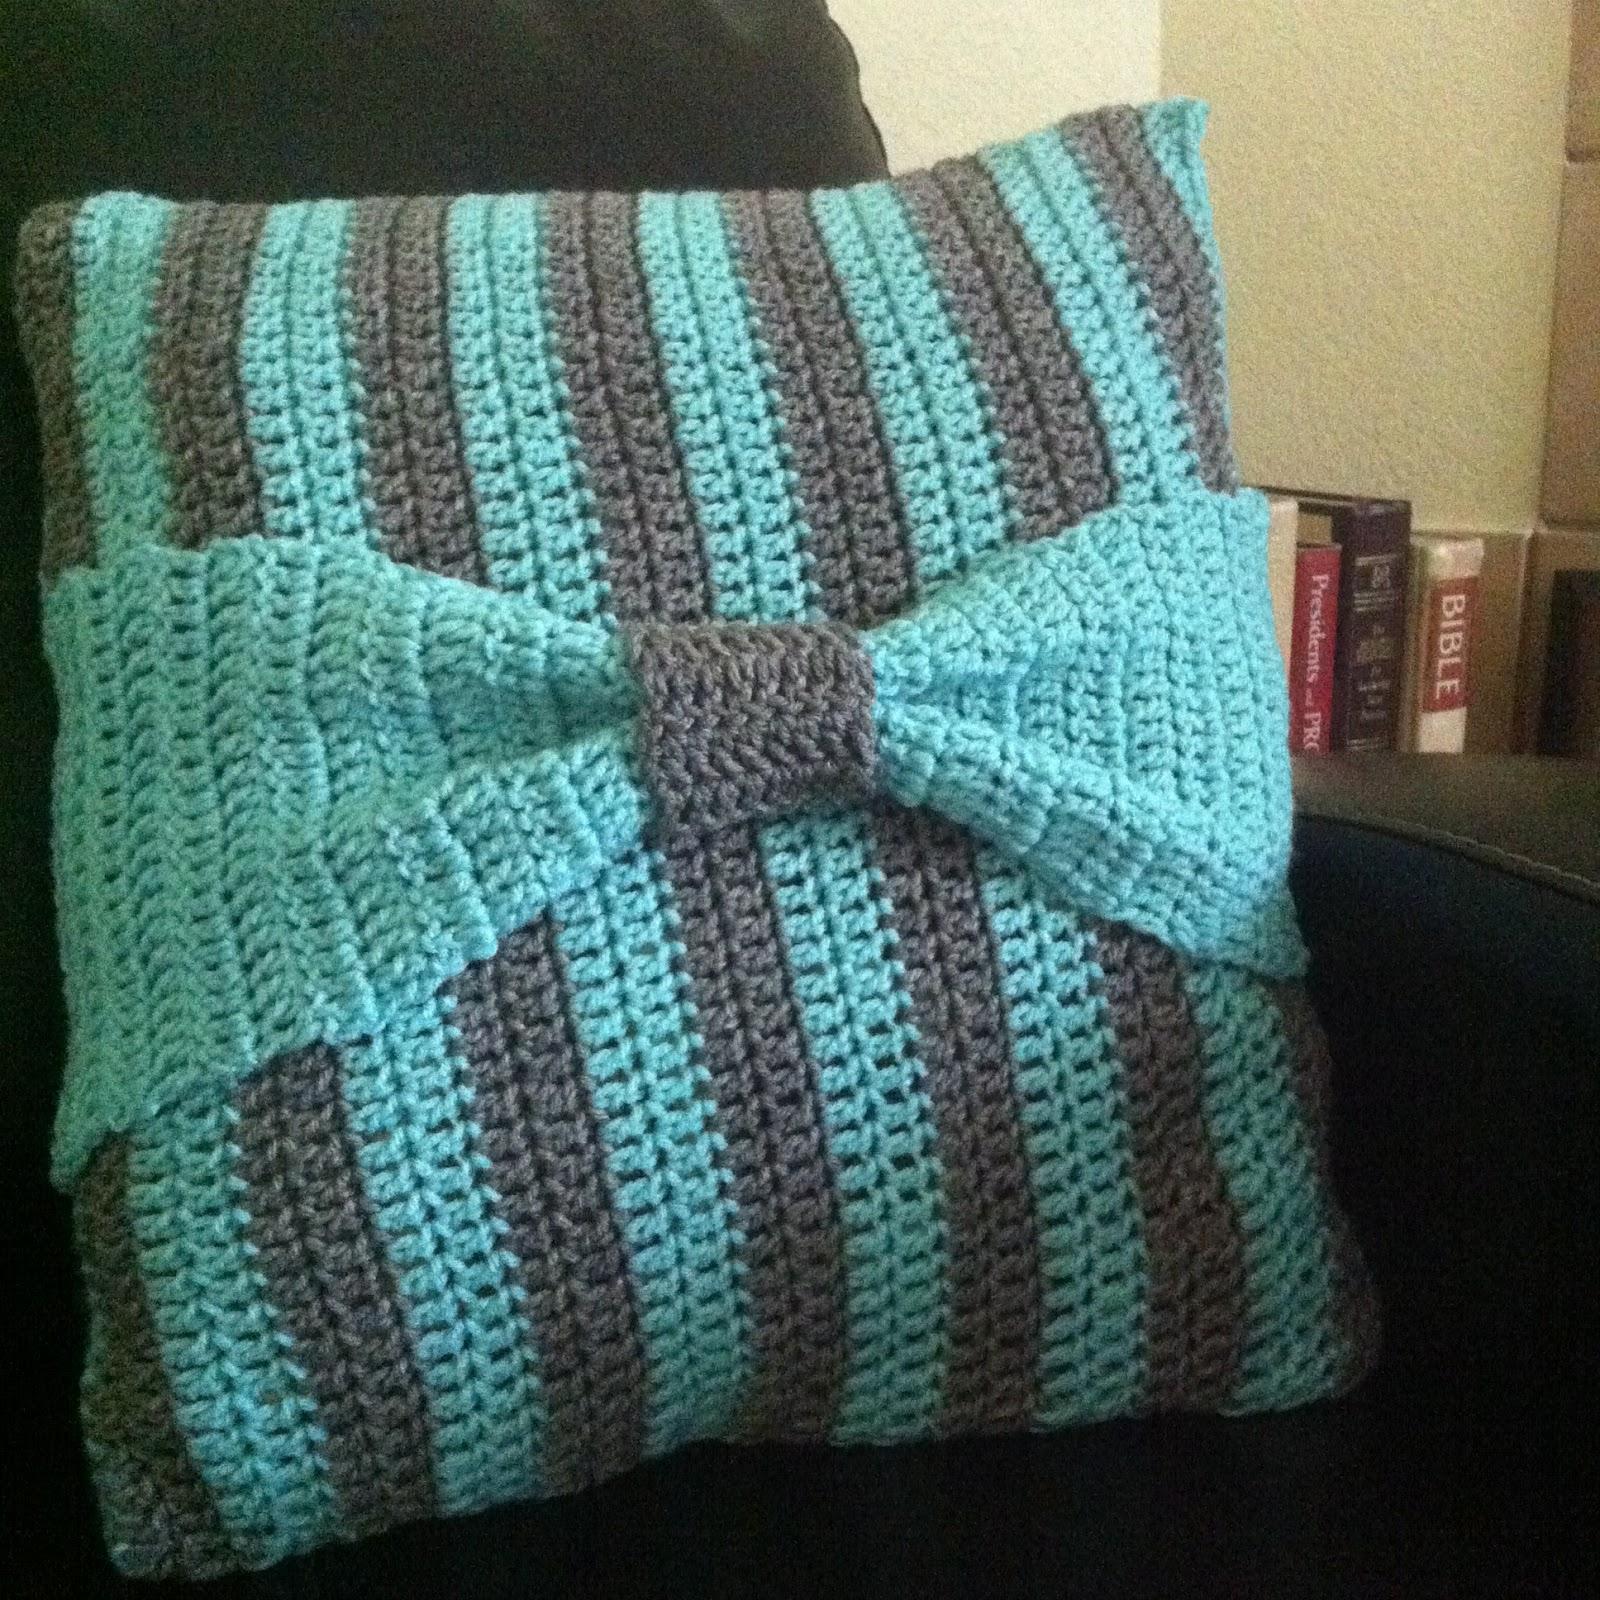 Crochet Sofa Cover Patterns Emerald Sofas Blackburn Design Adventures Striped Pillow